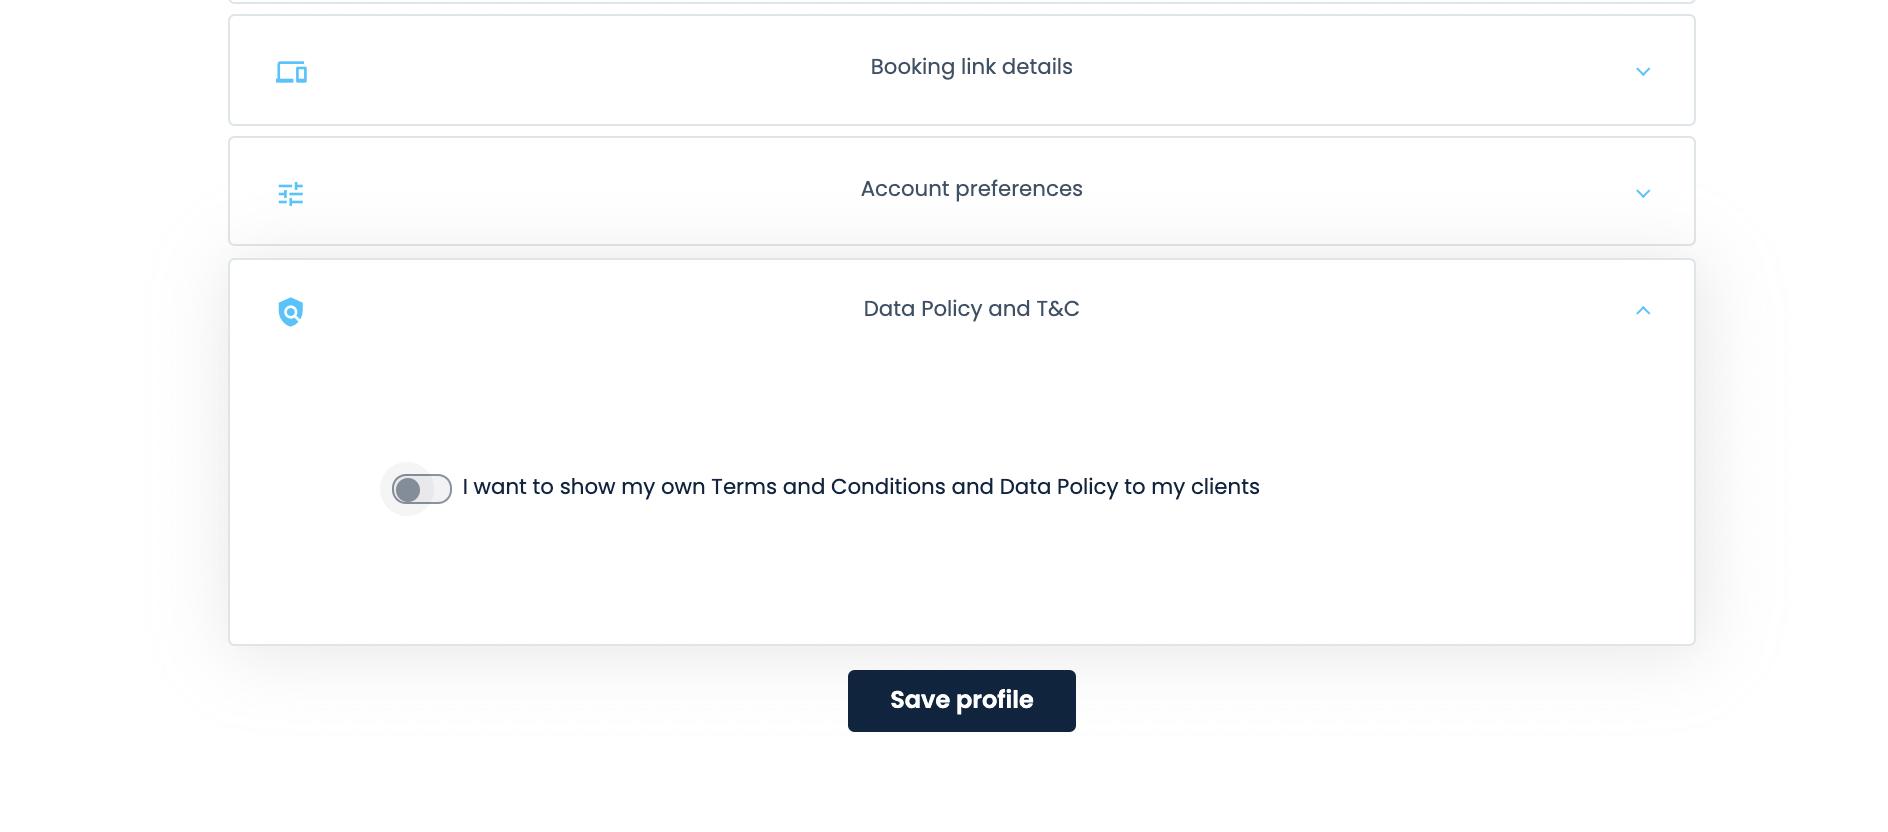 MeetFox - Add data policy